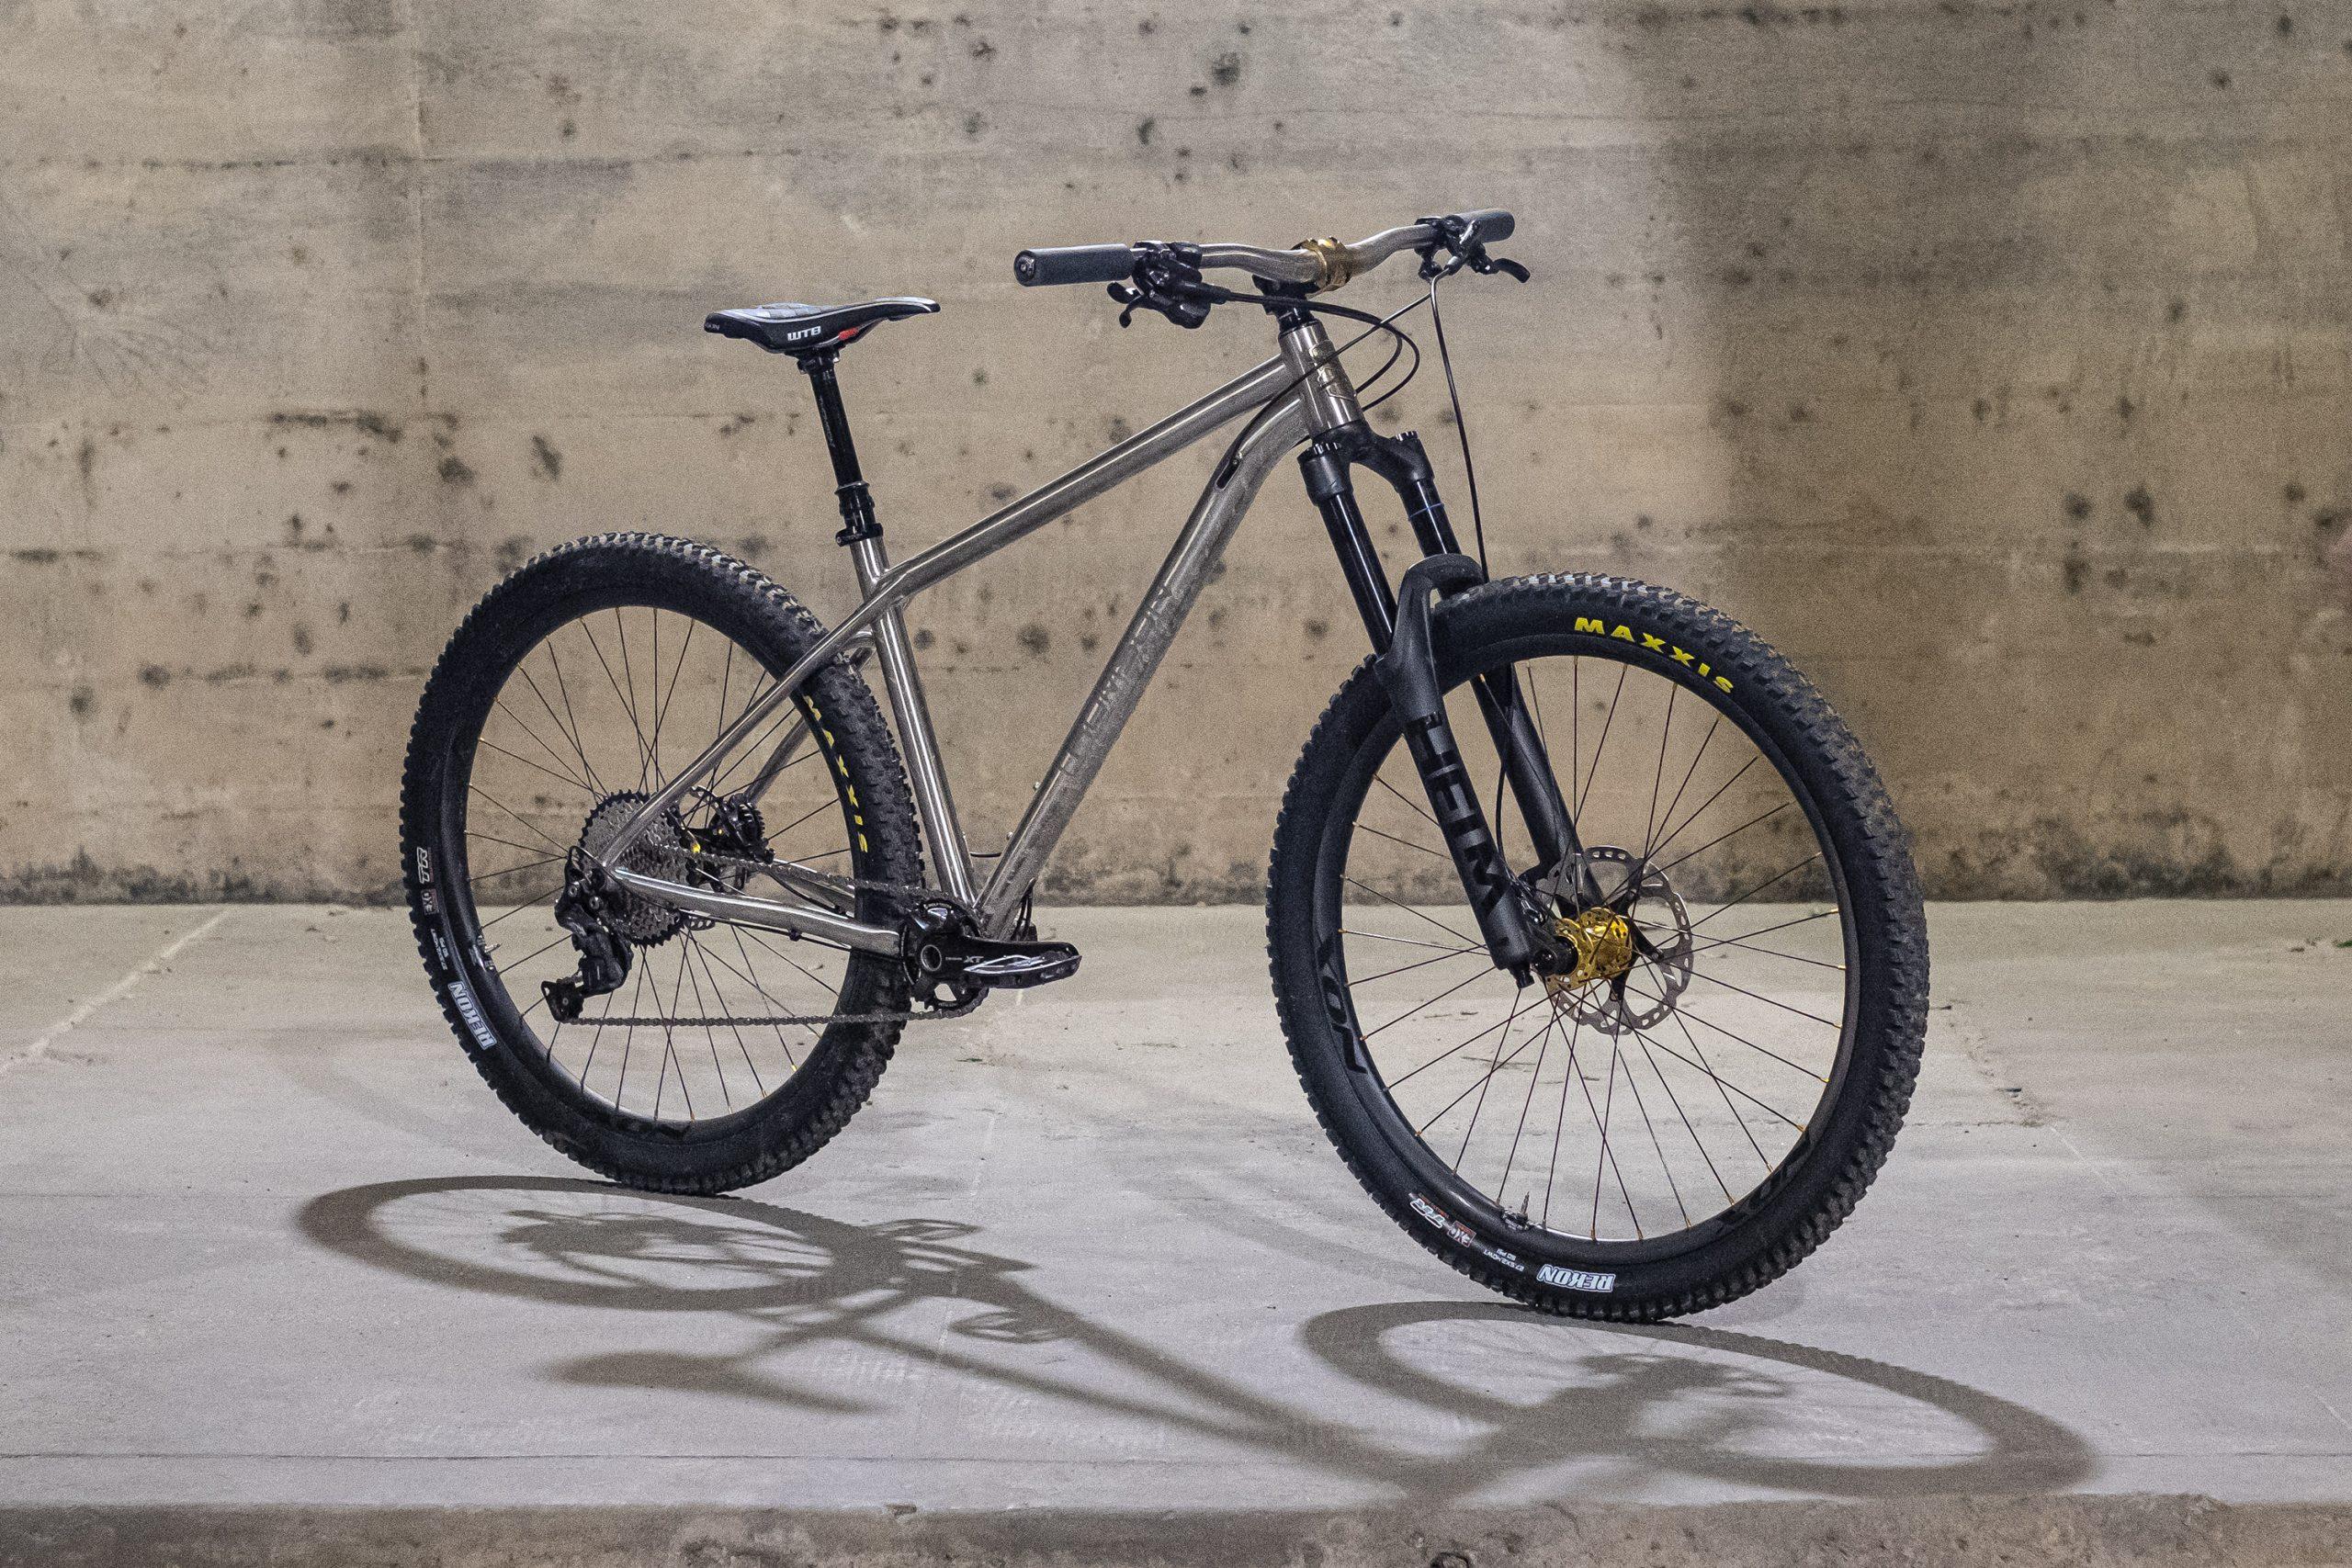 New Thomson Hooch Titanium Hardtail is Named after North Georgia's Chattahoochee - Singletracks Mountain Bike News